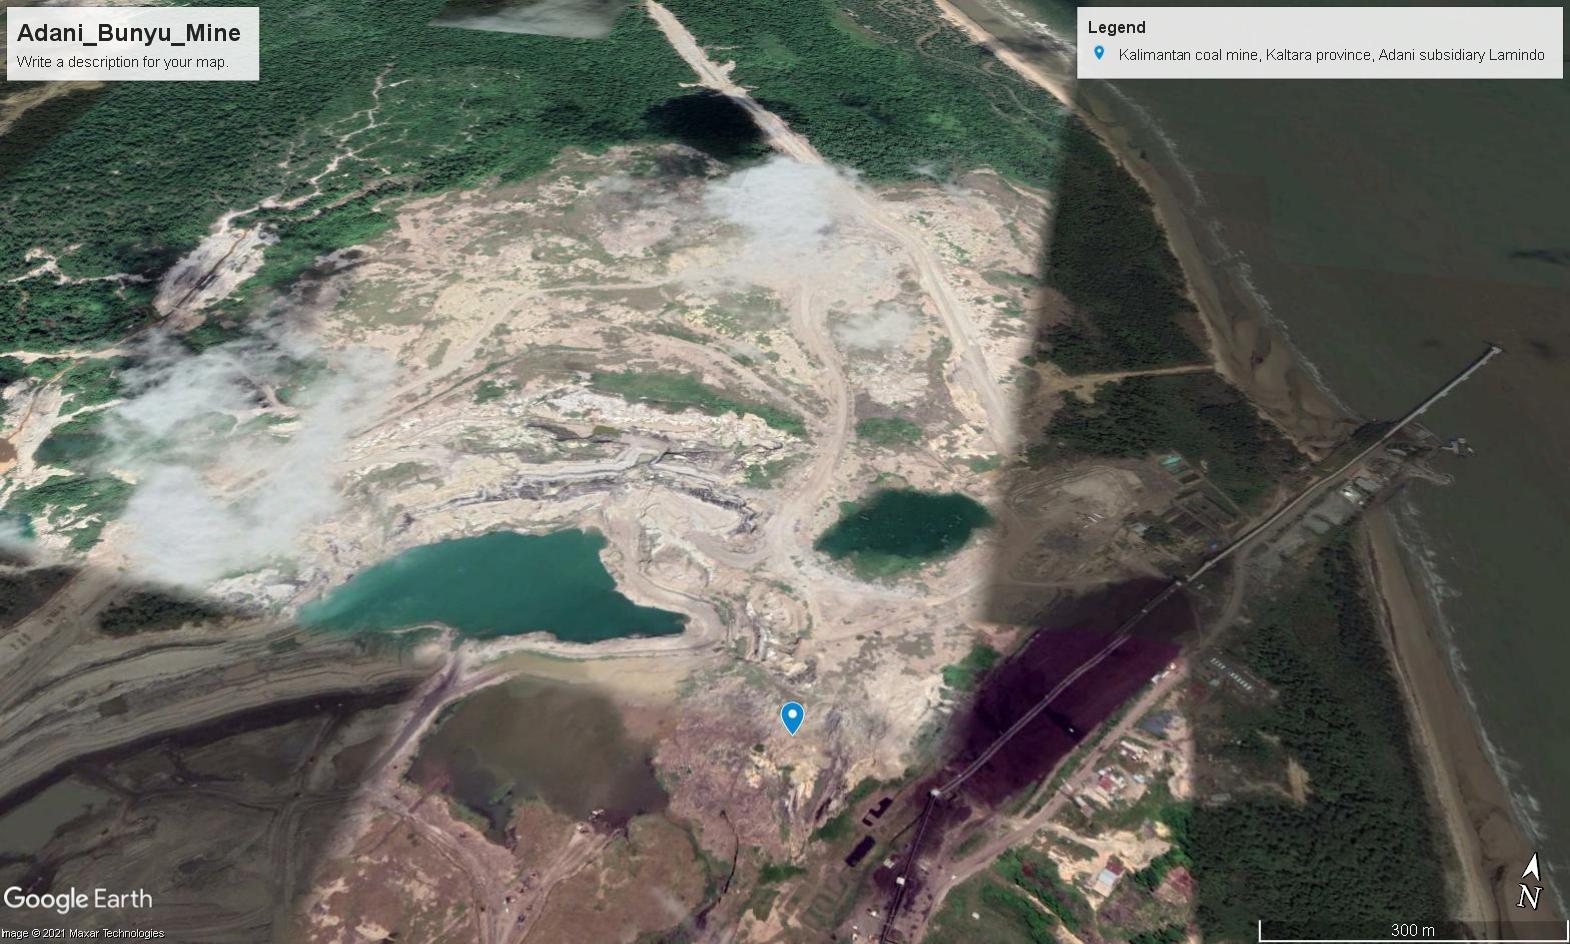 Adani's Bunyu coal mine, North Kalimantan. Photo Google Earth